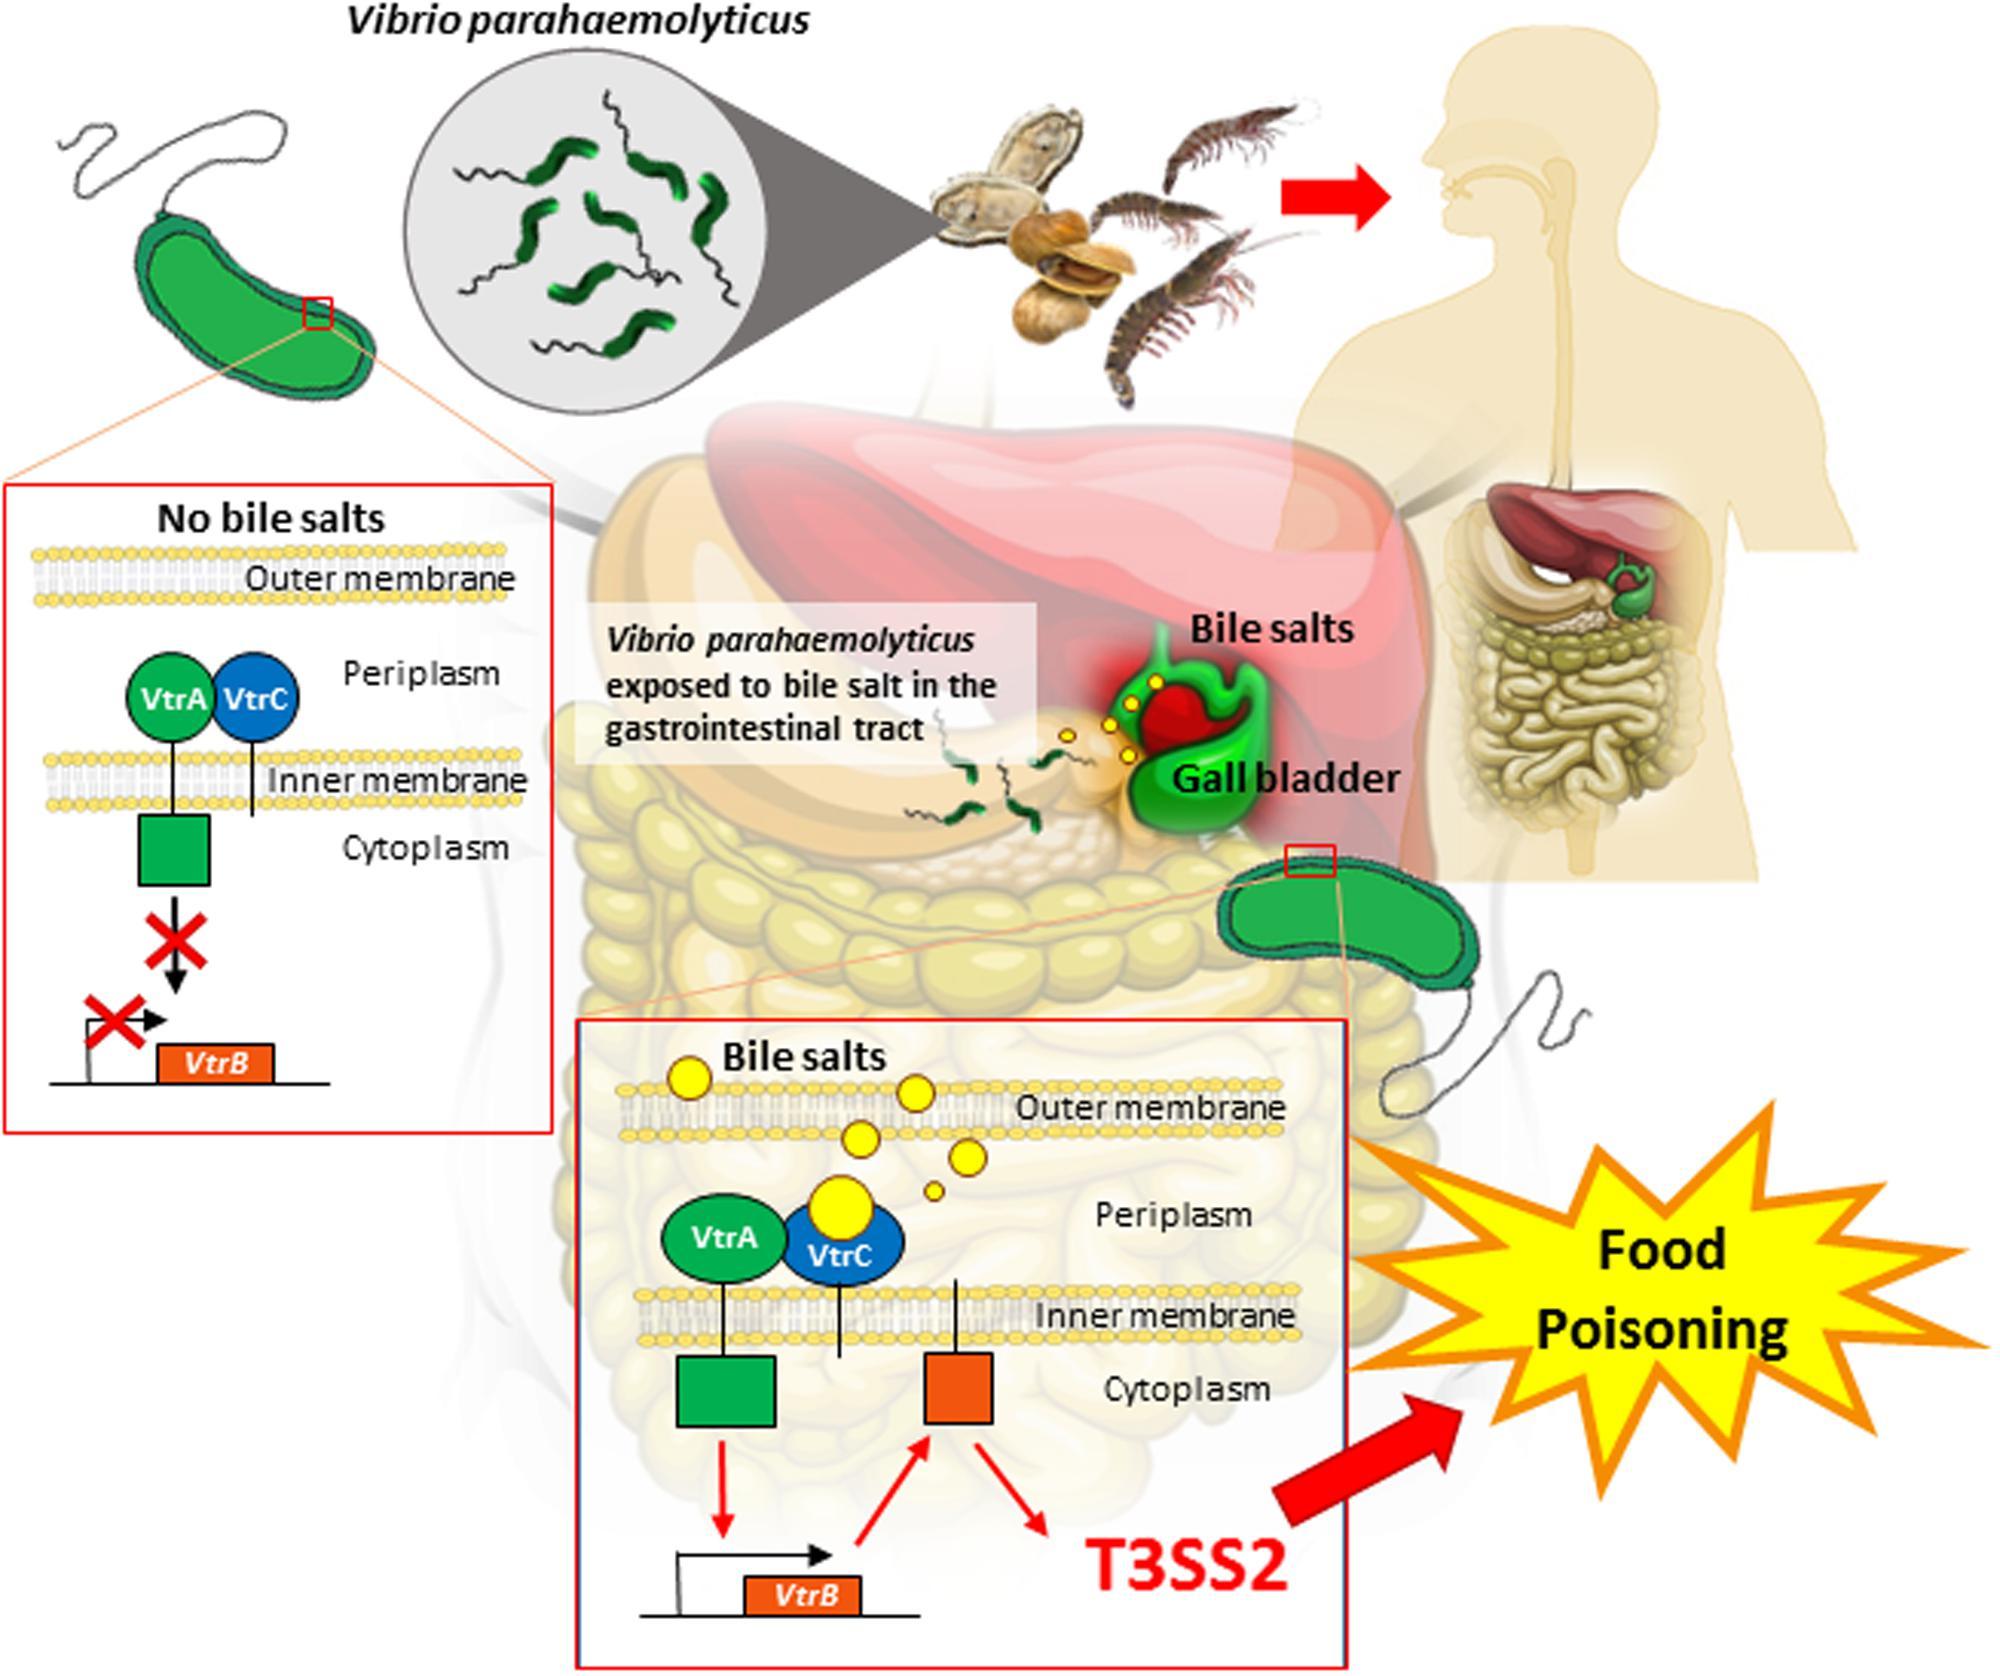 Frontiers Bile Sensing The Activation Of Vibrio Parahaemolyticus